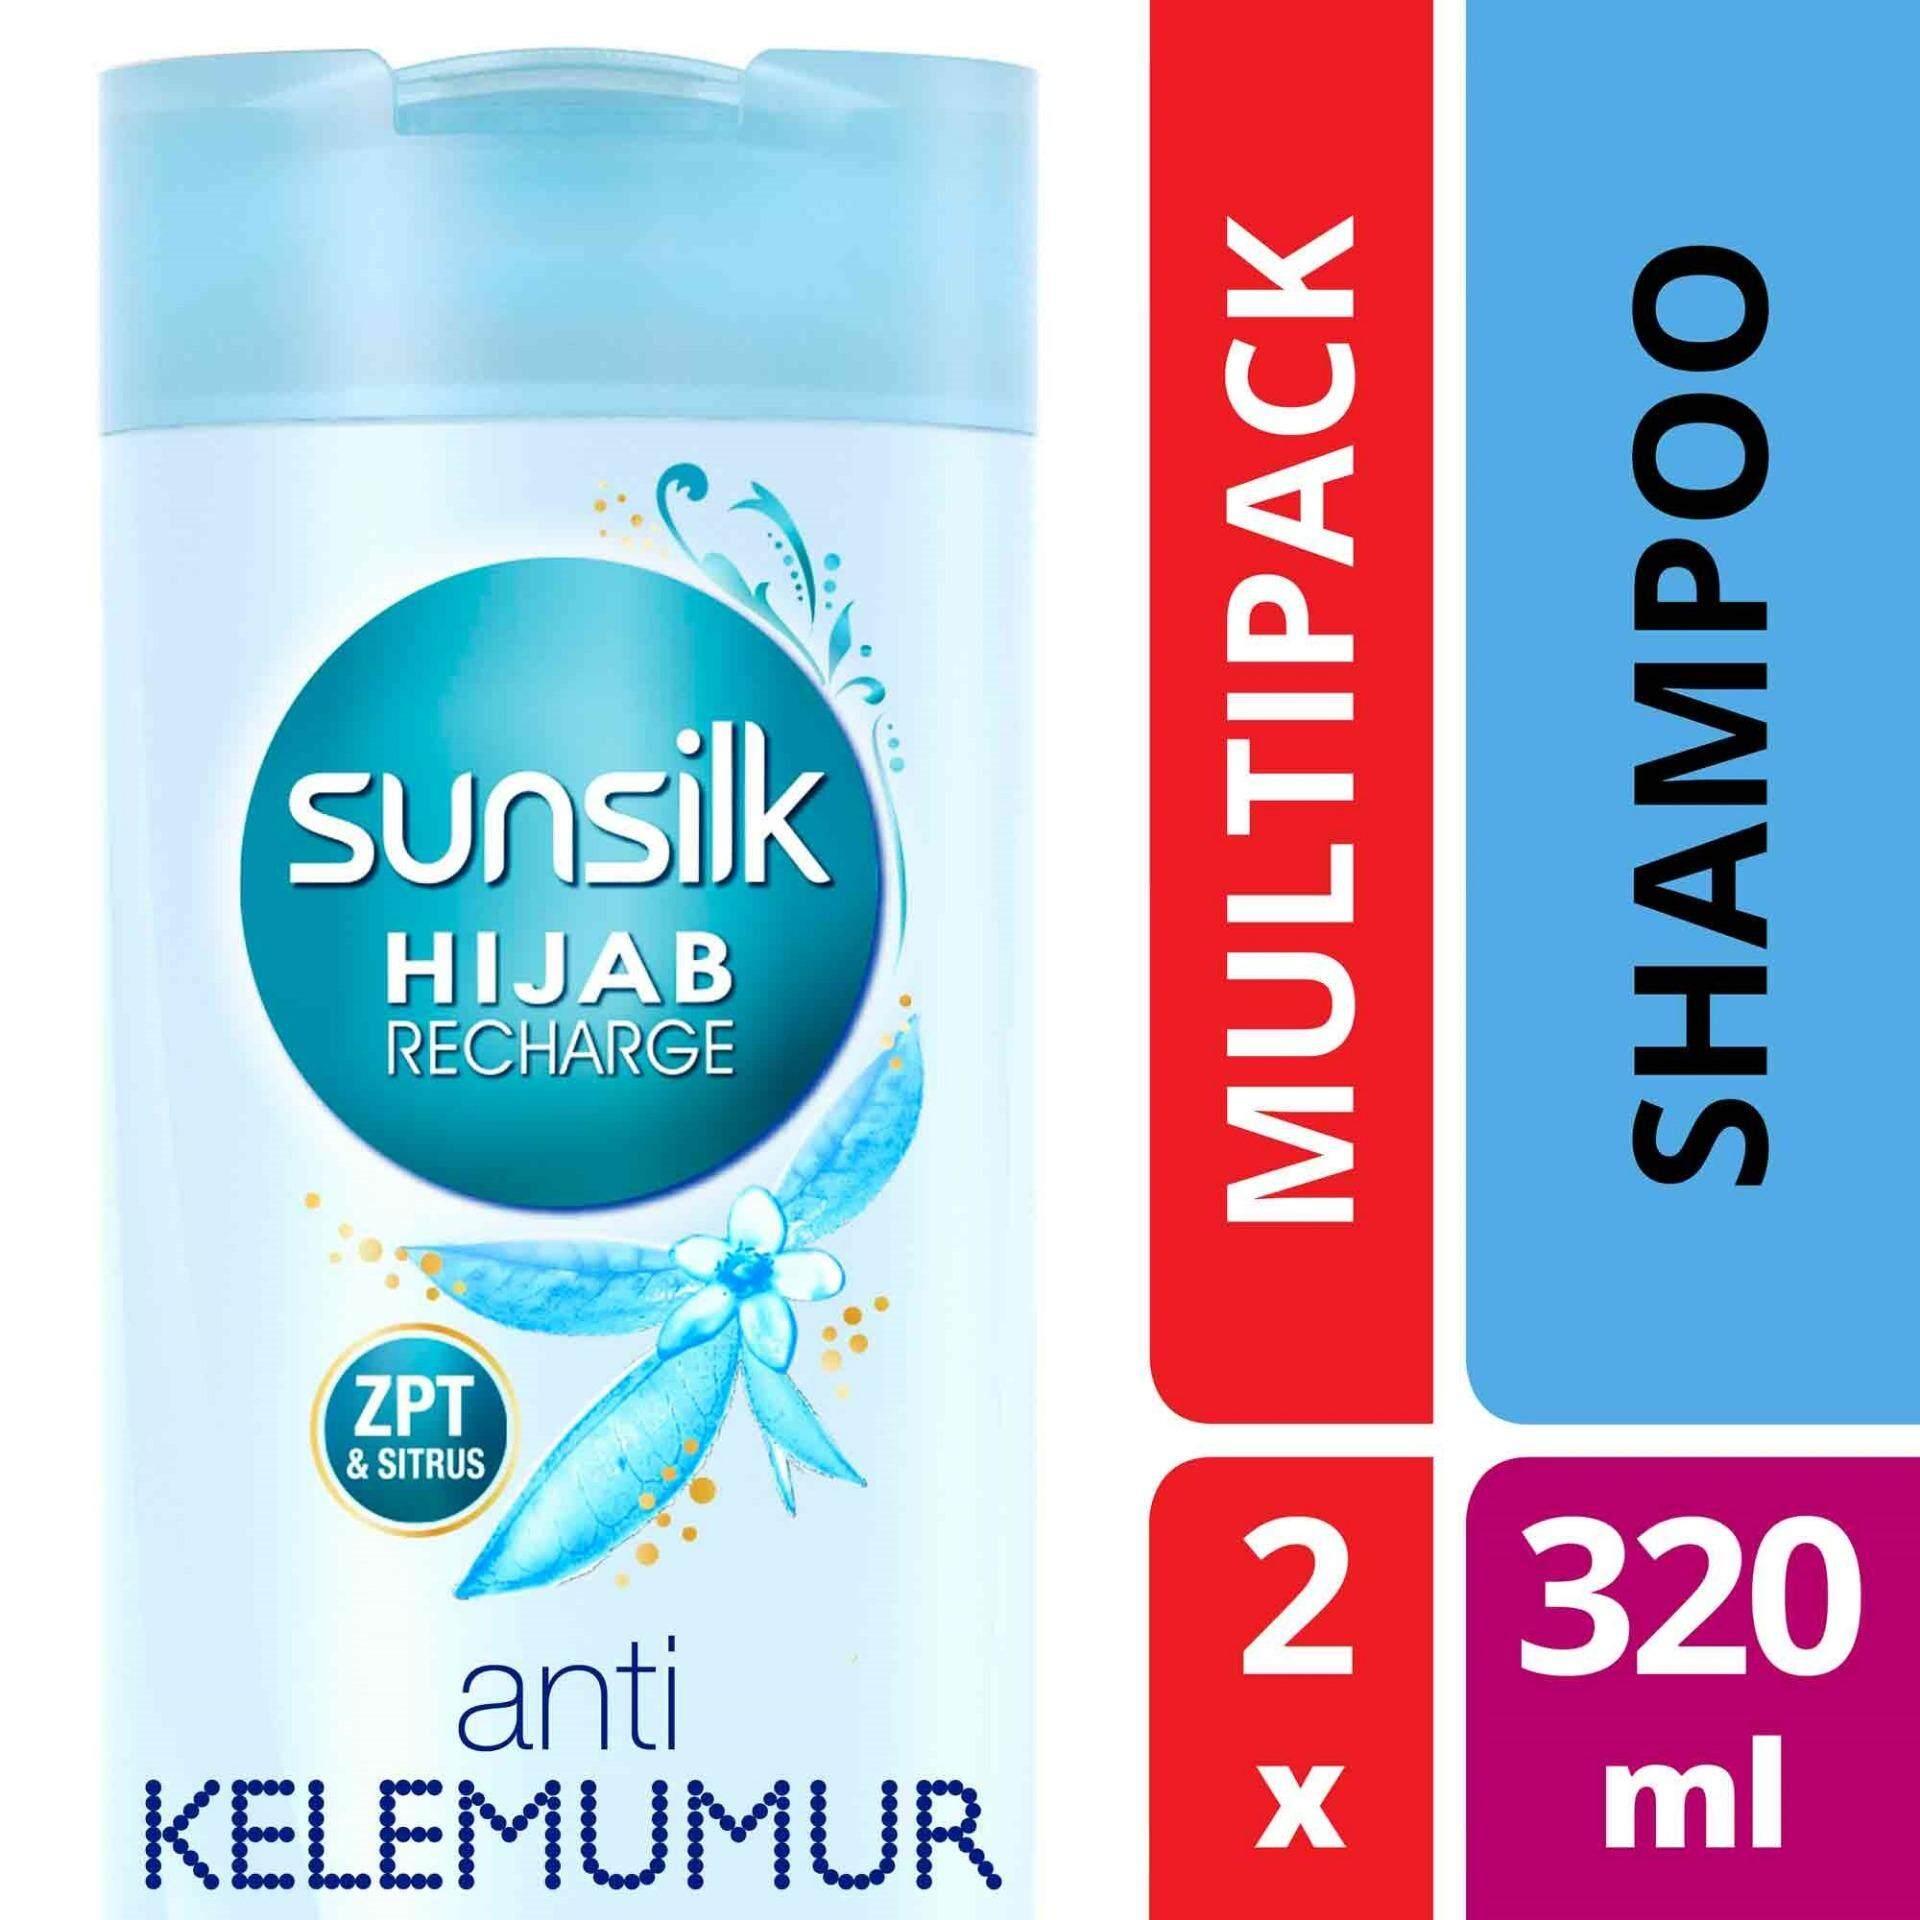 Sunsilk Hijab Anti Dandruff Shampoo 320 Ml X 2 Malaysia 170ml